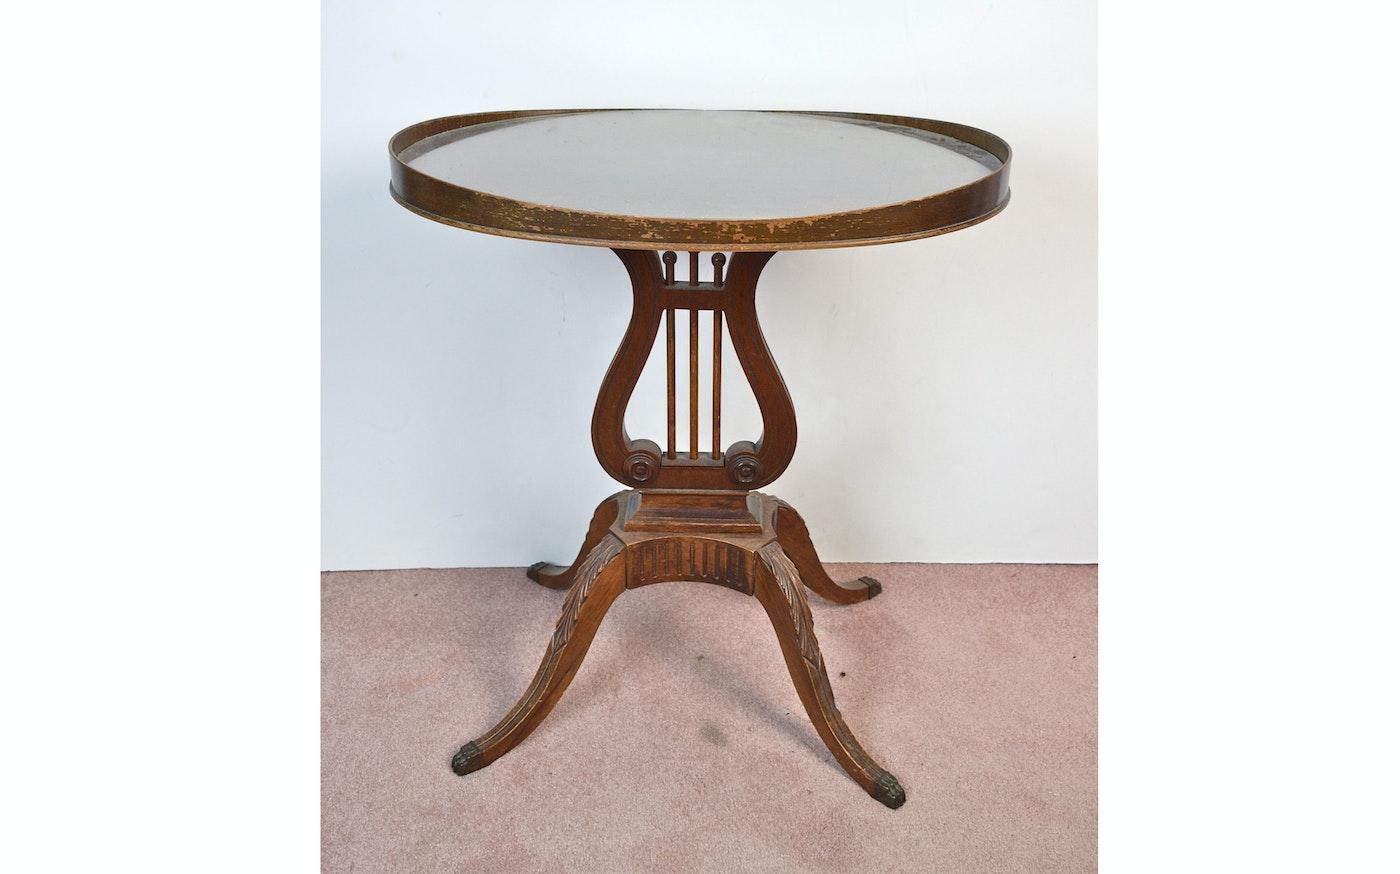 Mersman harp table ebth for Table rrq 2015 52